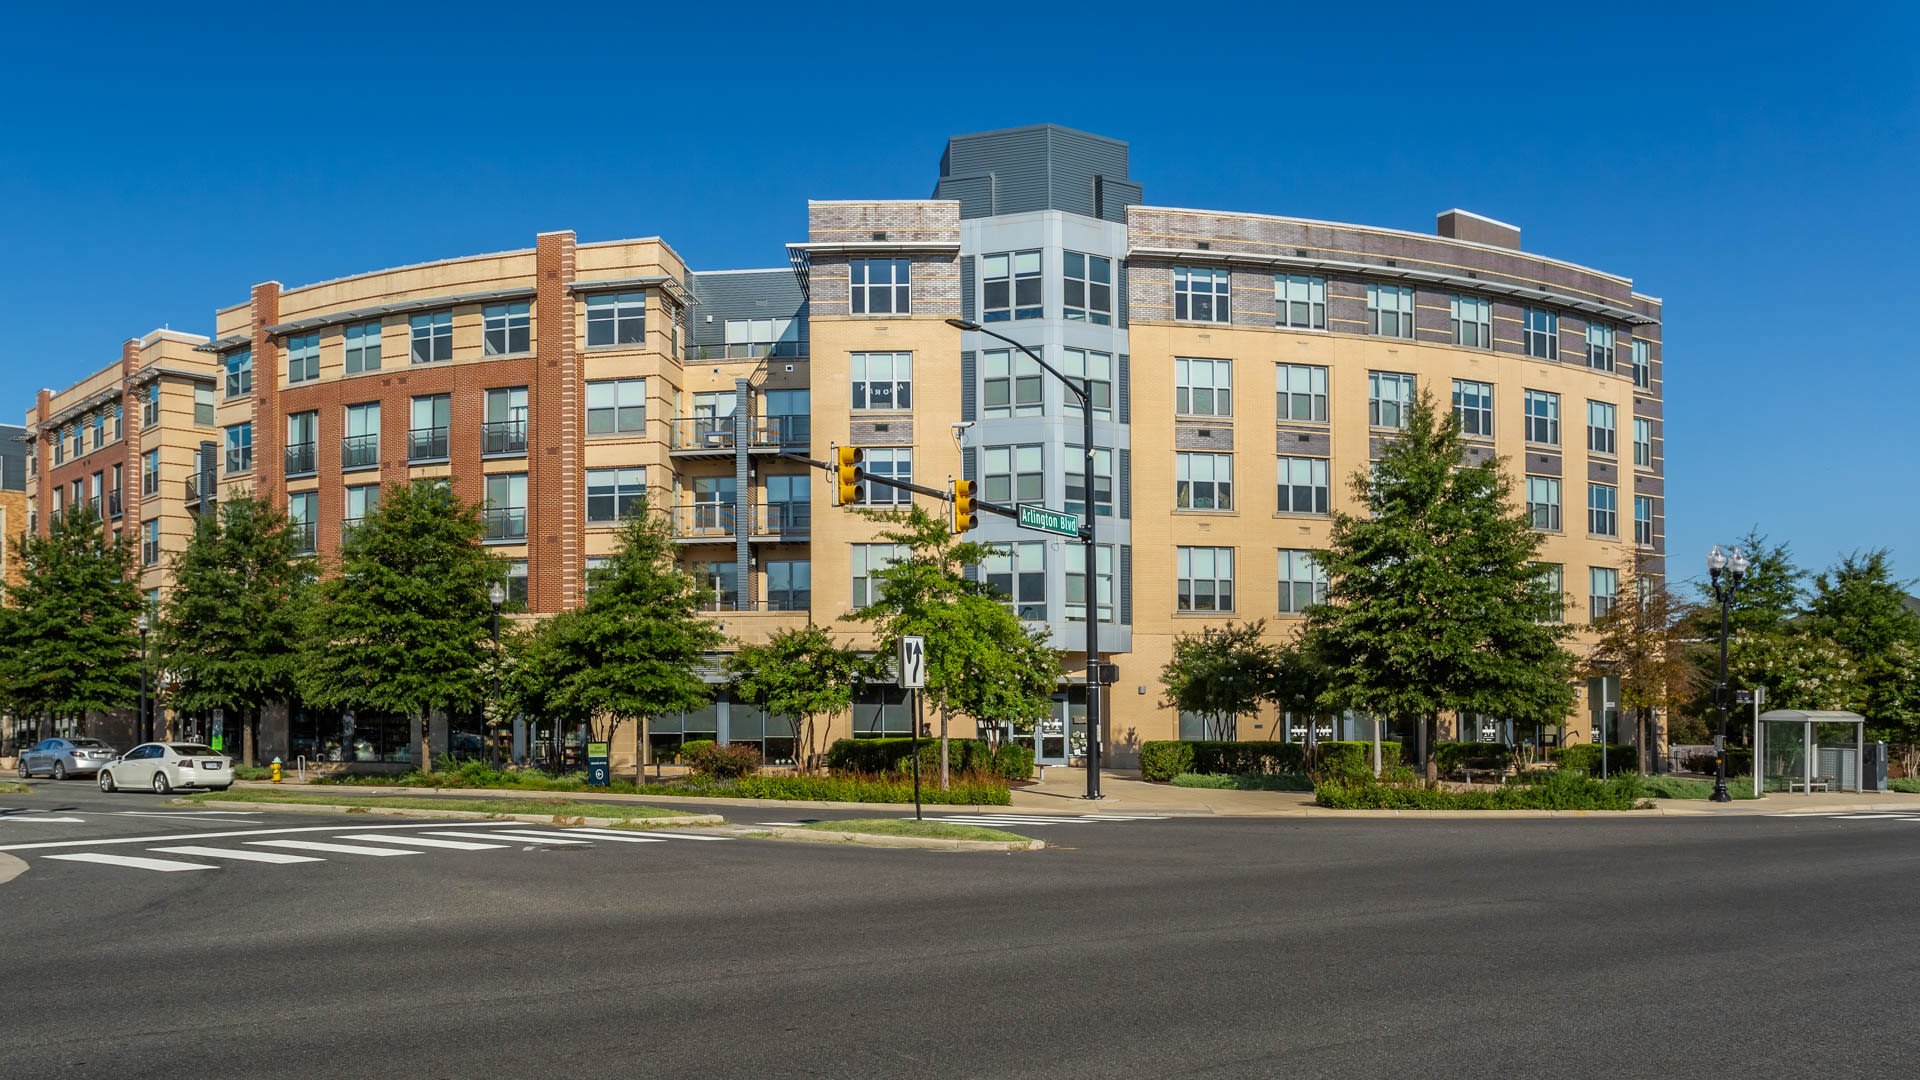 2201 Pershing Apartments - Exterior